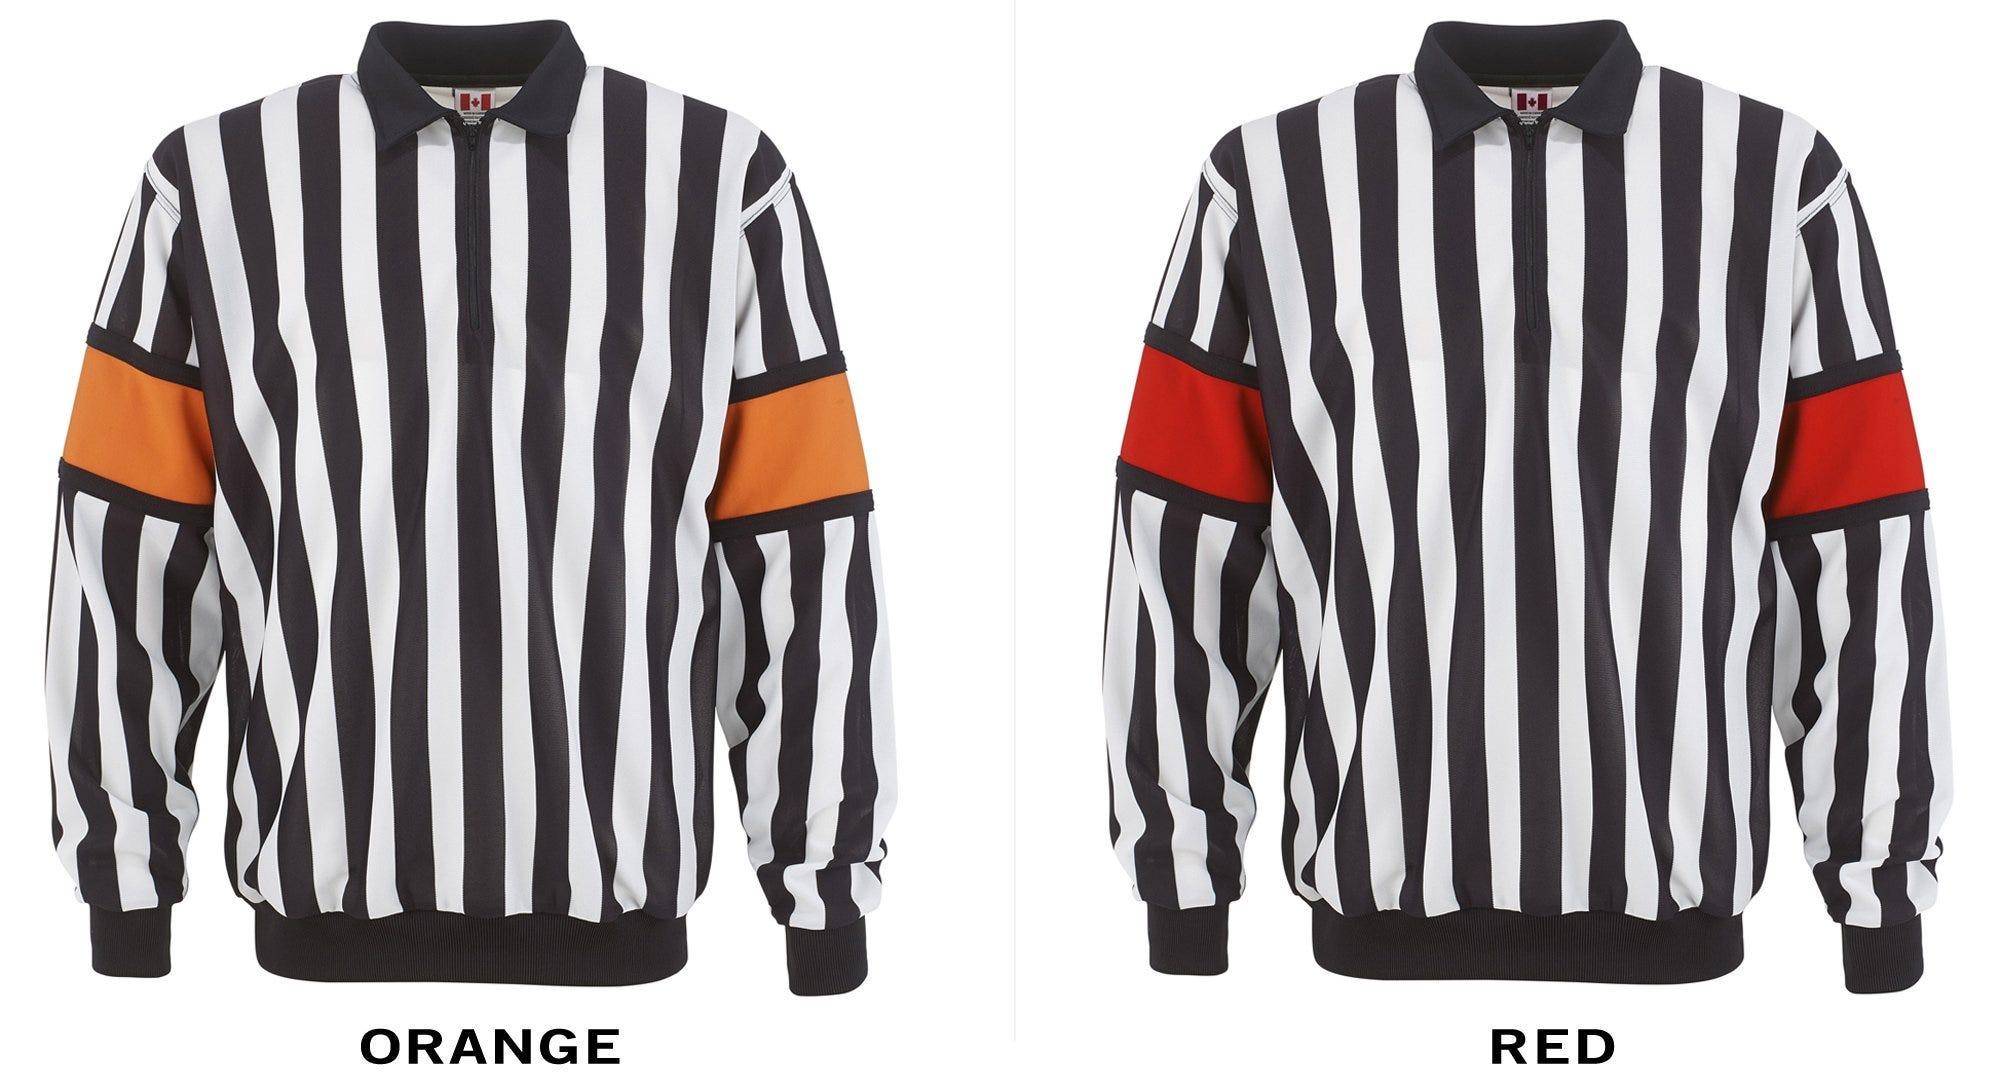 ice hockey referee shirt - allusionsstl.com b2a080ea279